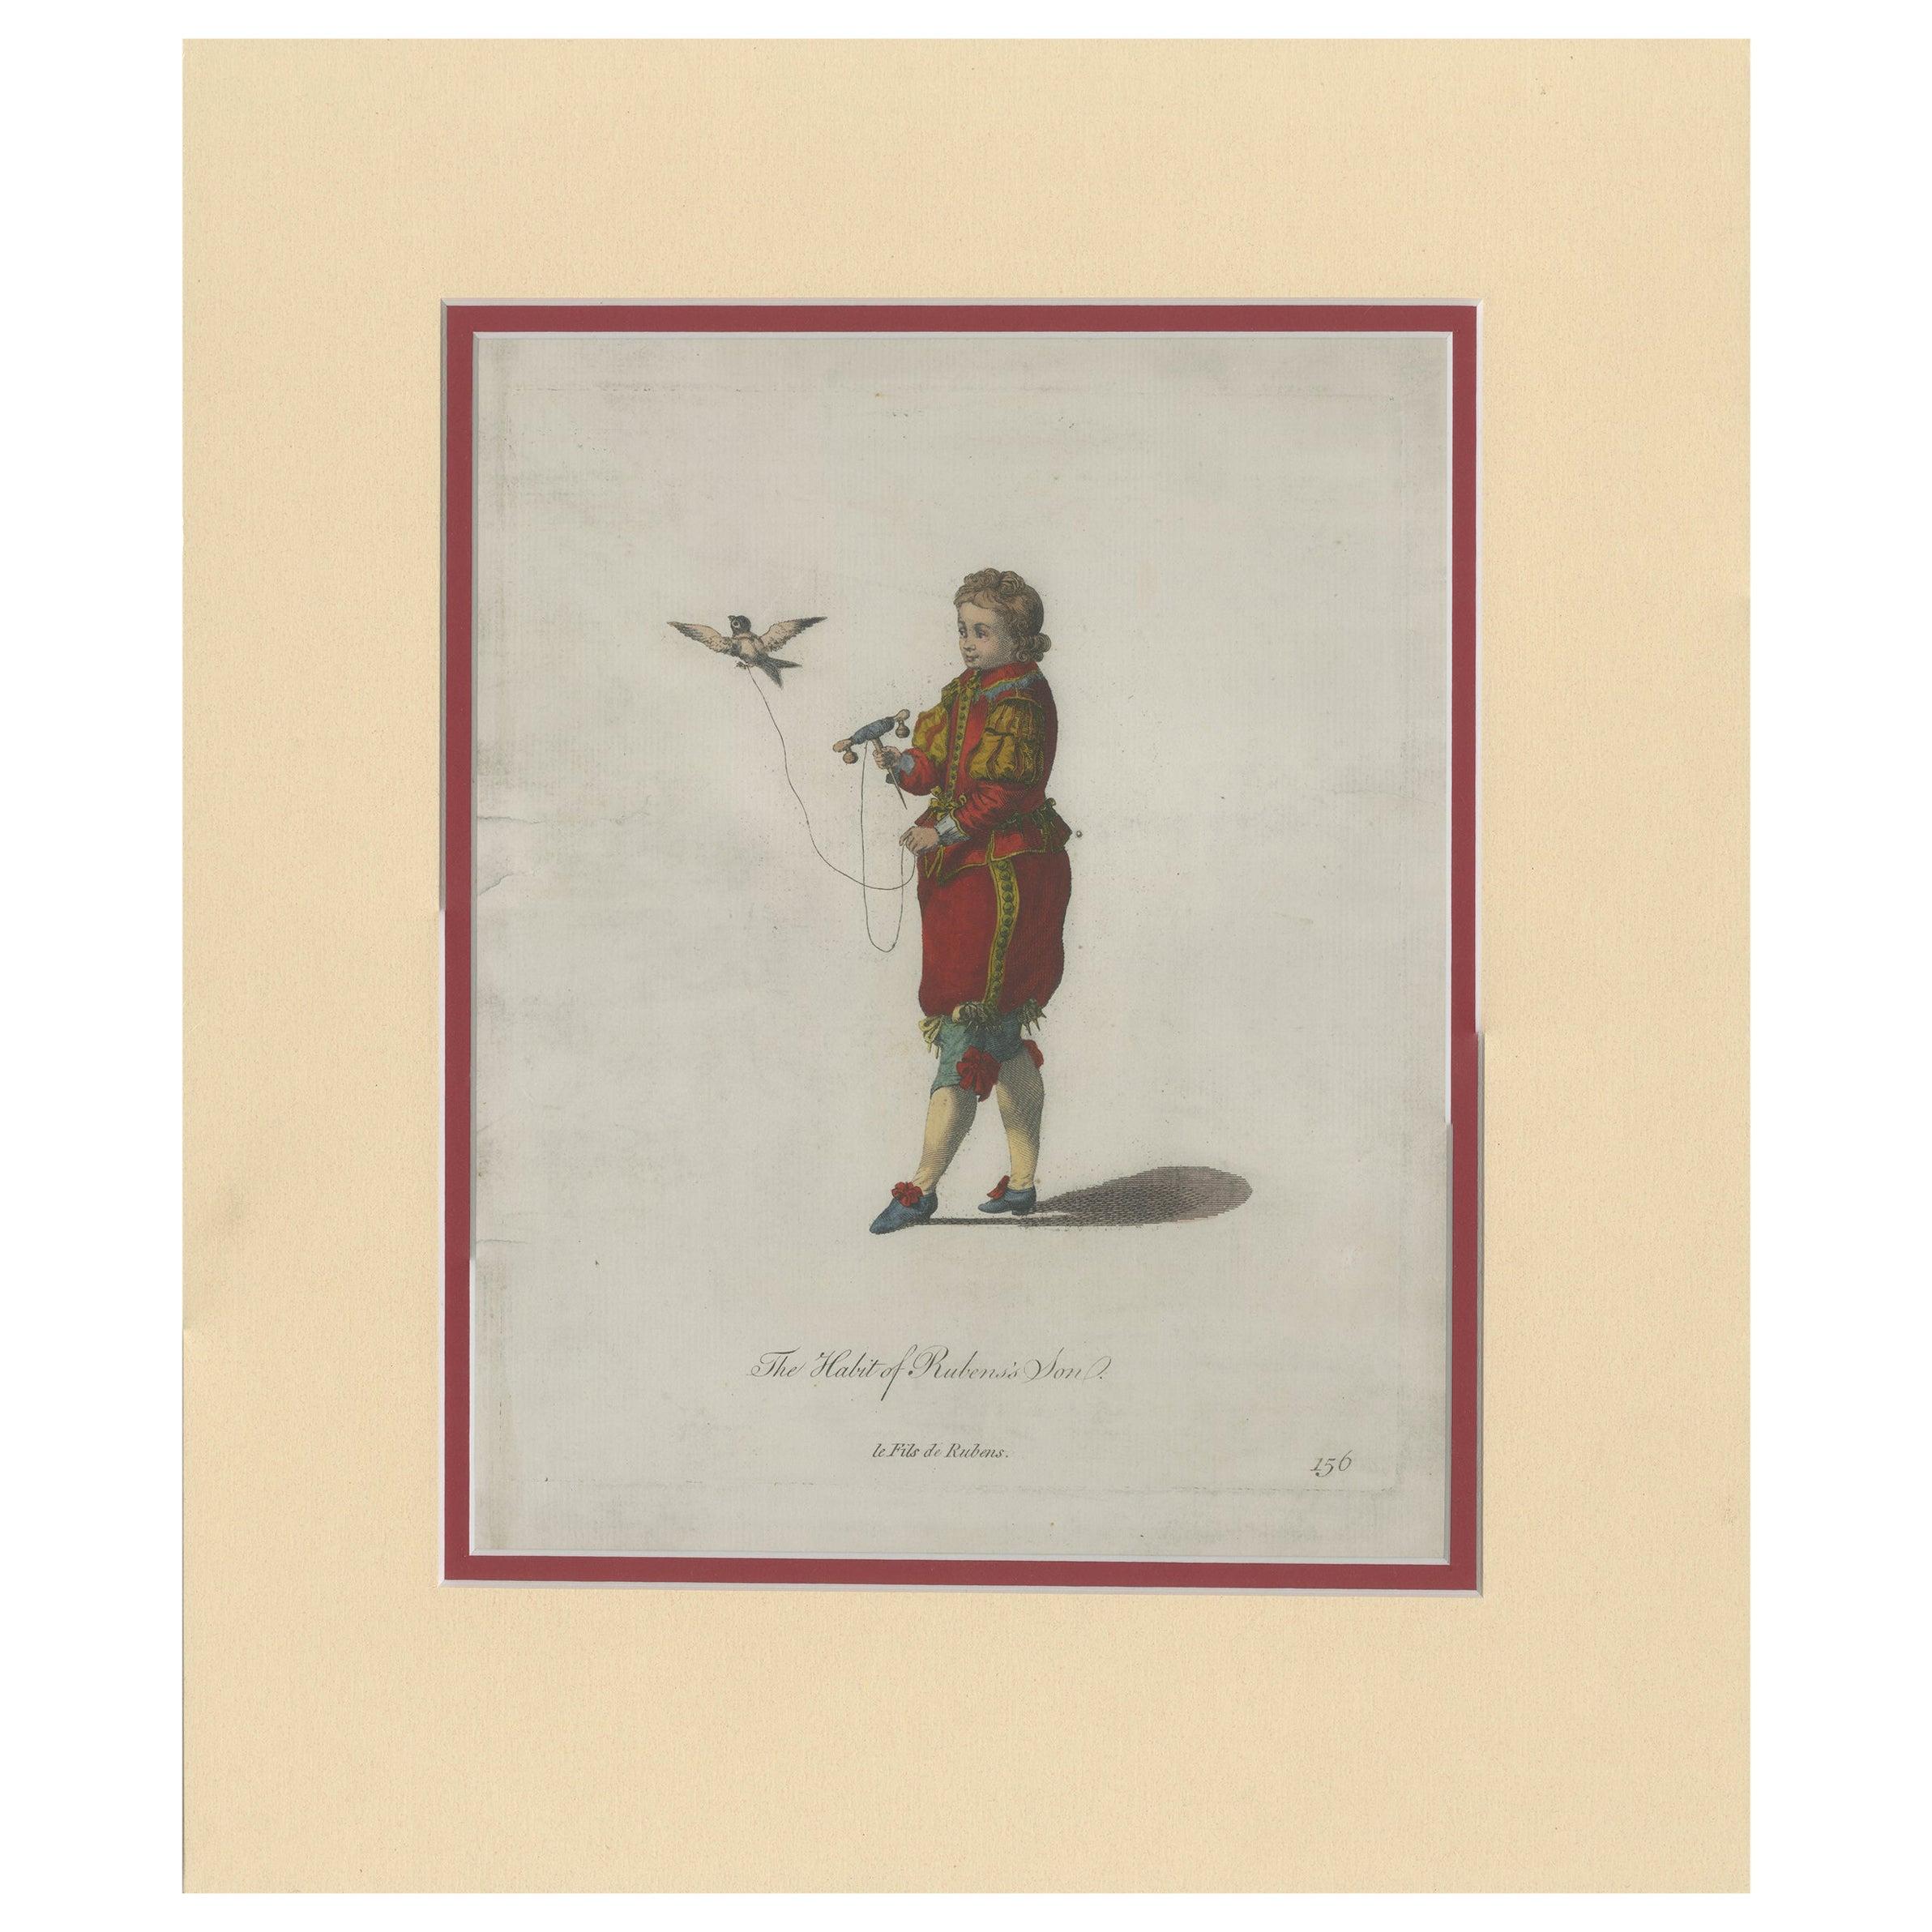 Antique Print of Rubens' son by Jefferys '1772'